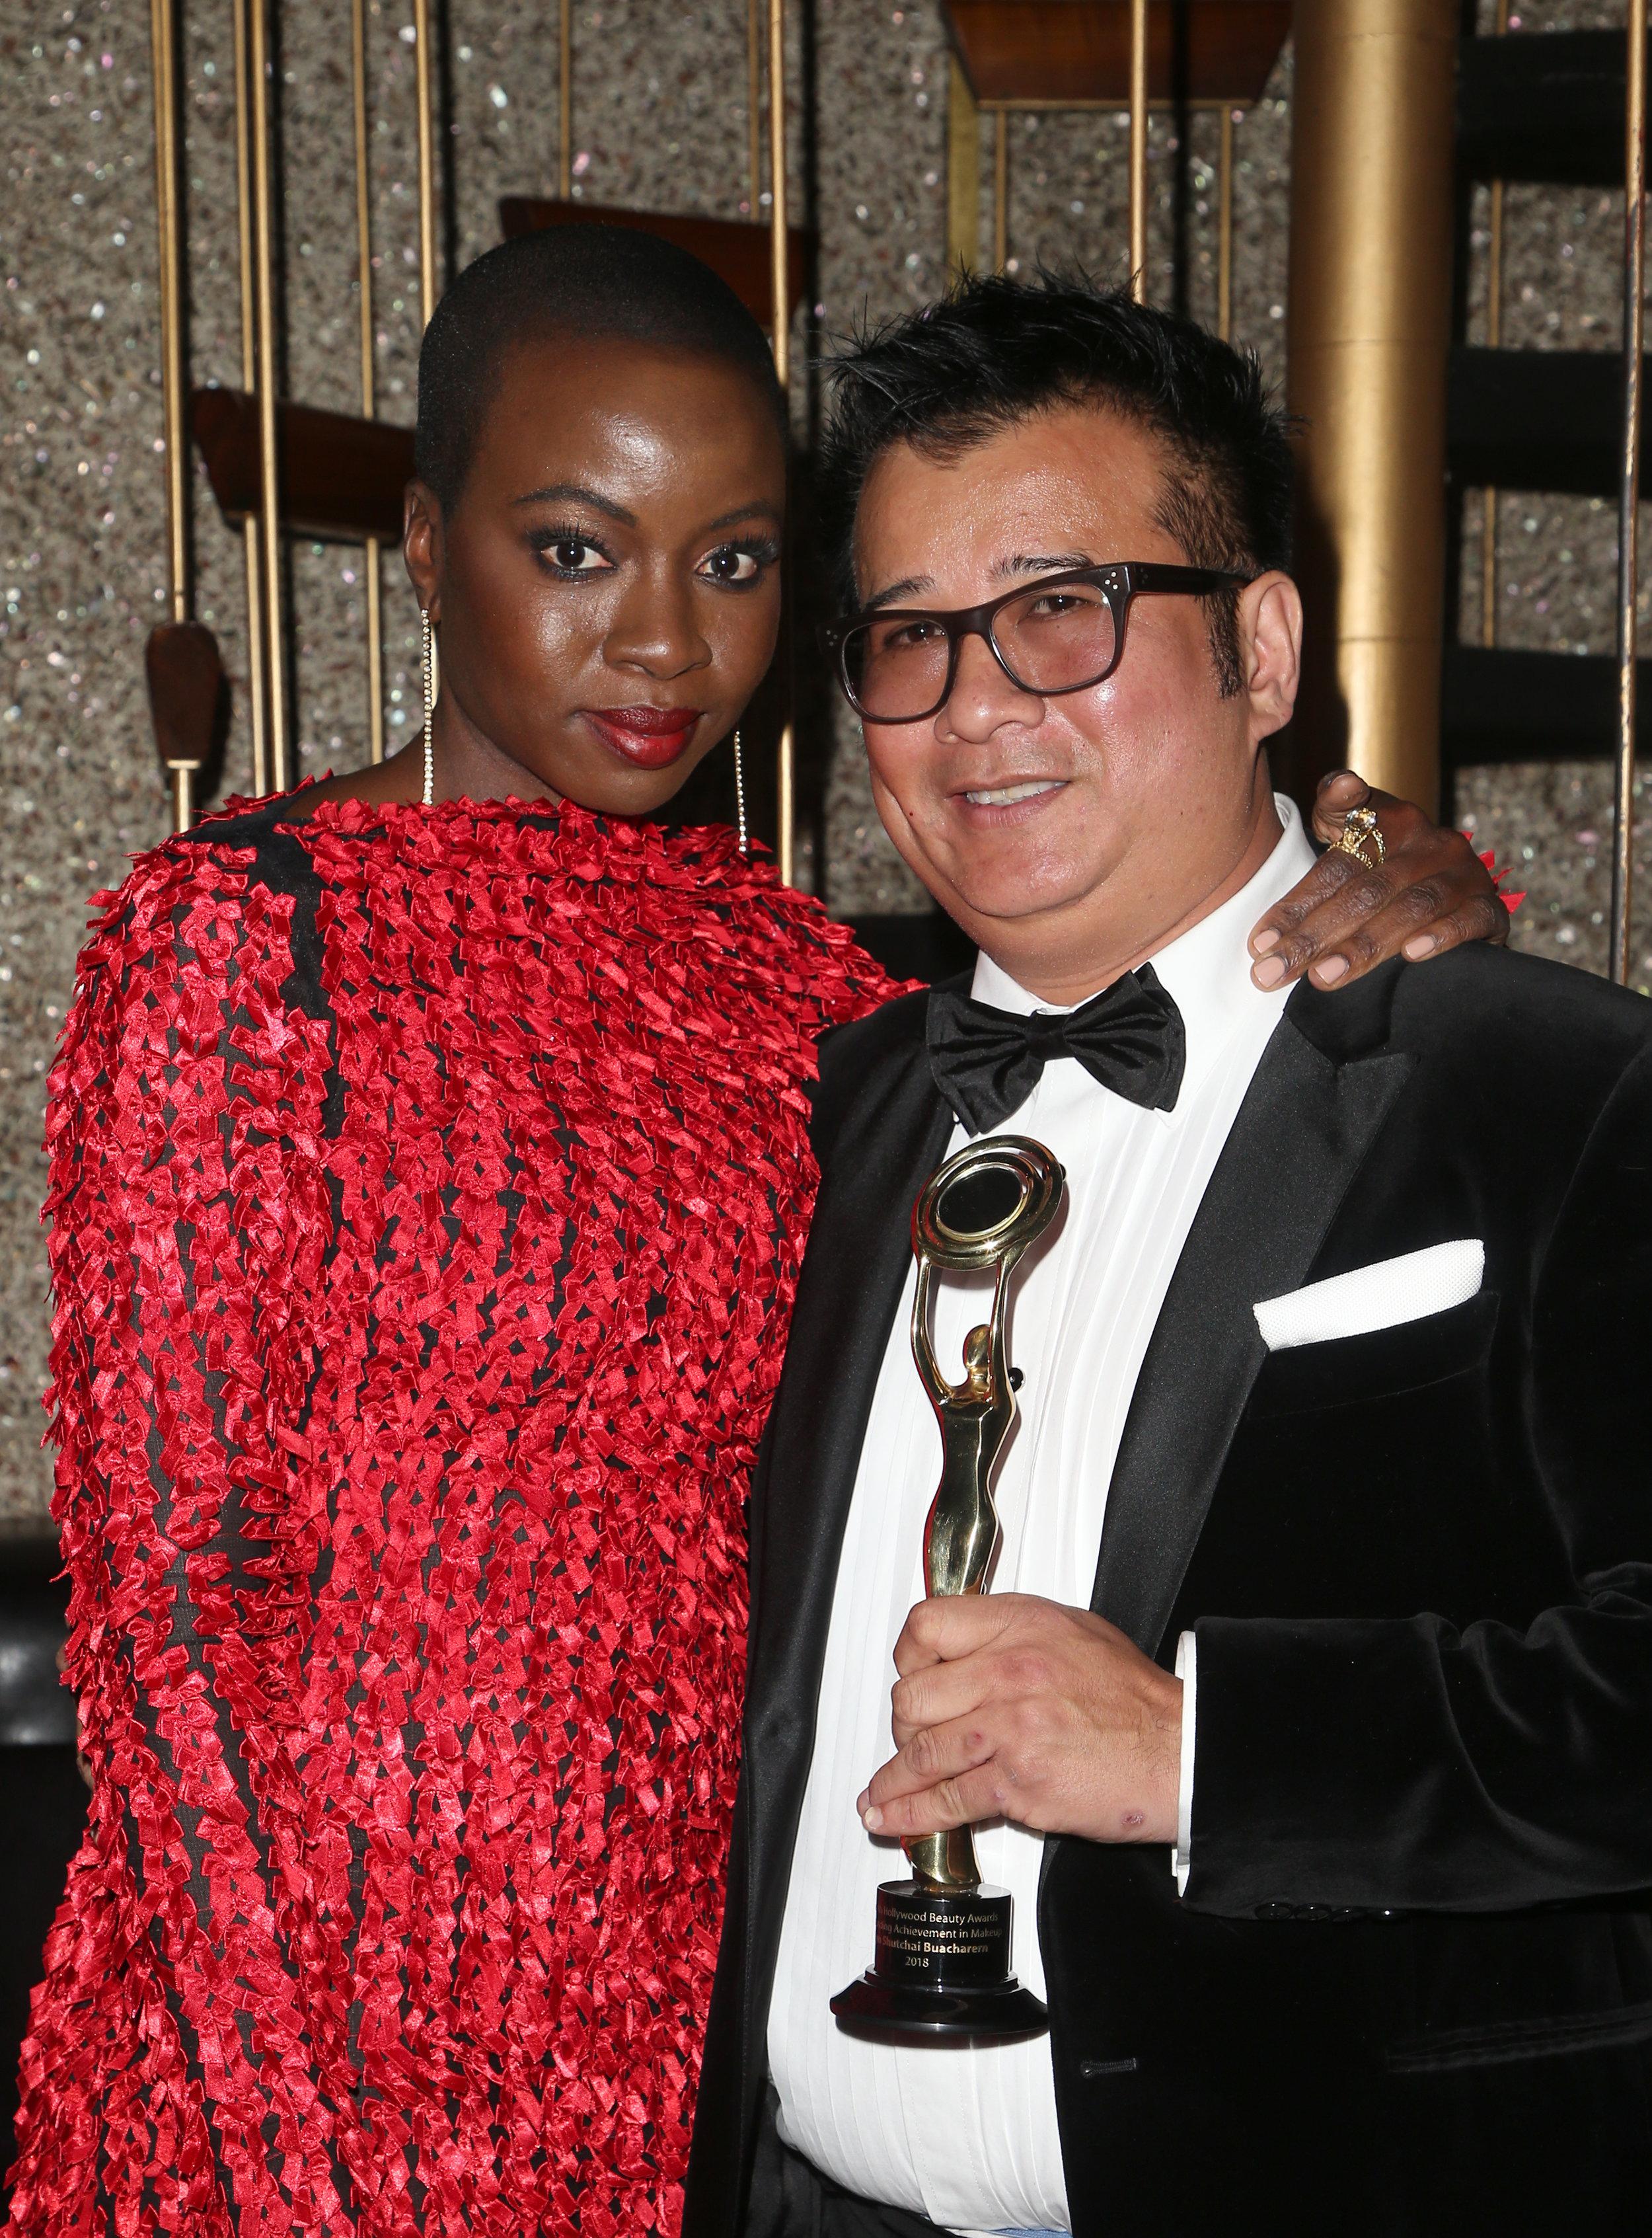 Danai Gurira and Tym Shutchai Buacharern | Feb 25, 2018, Hollywood Beauty Awards held at the Avalon